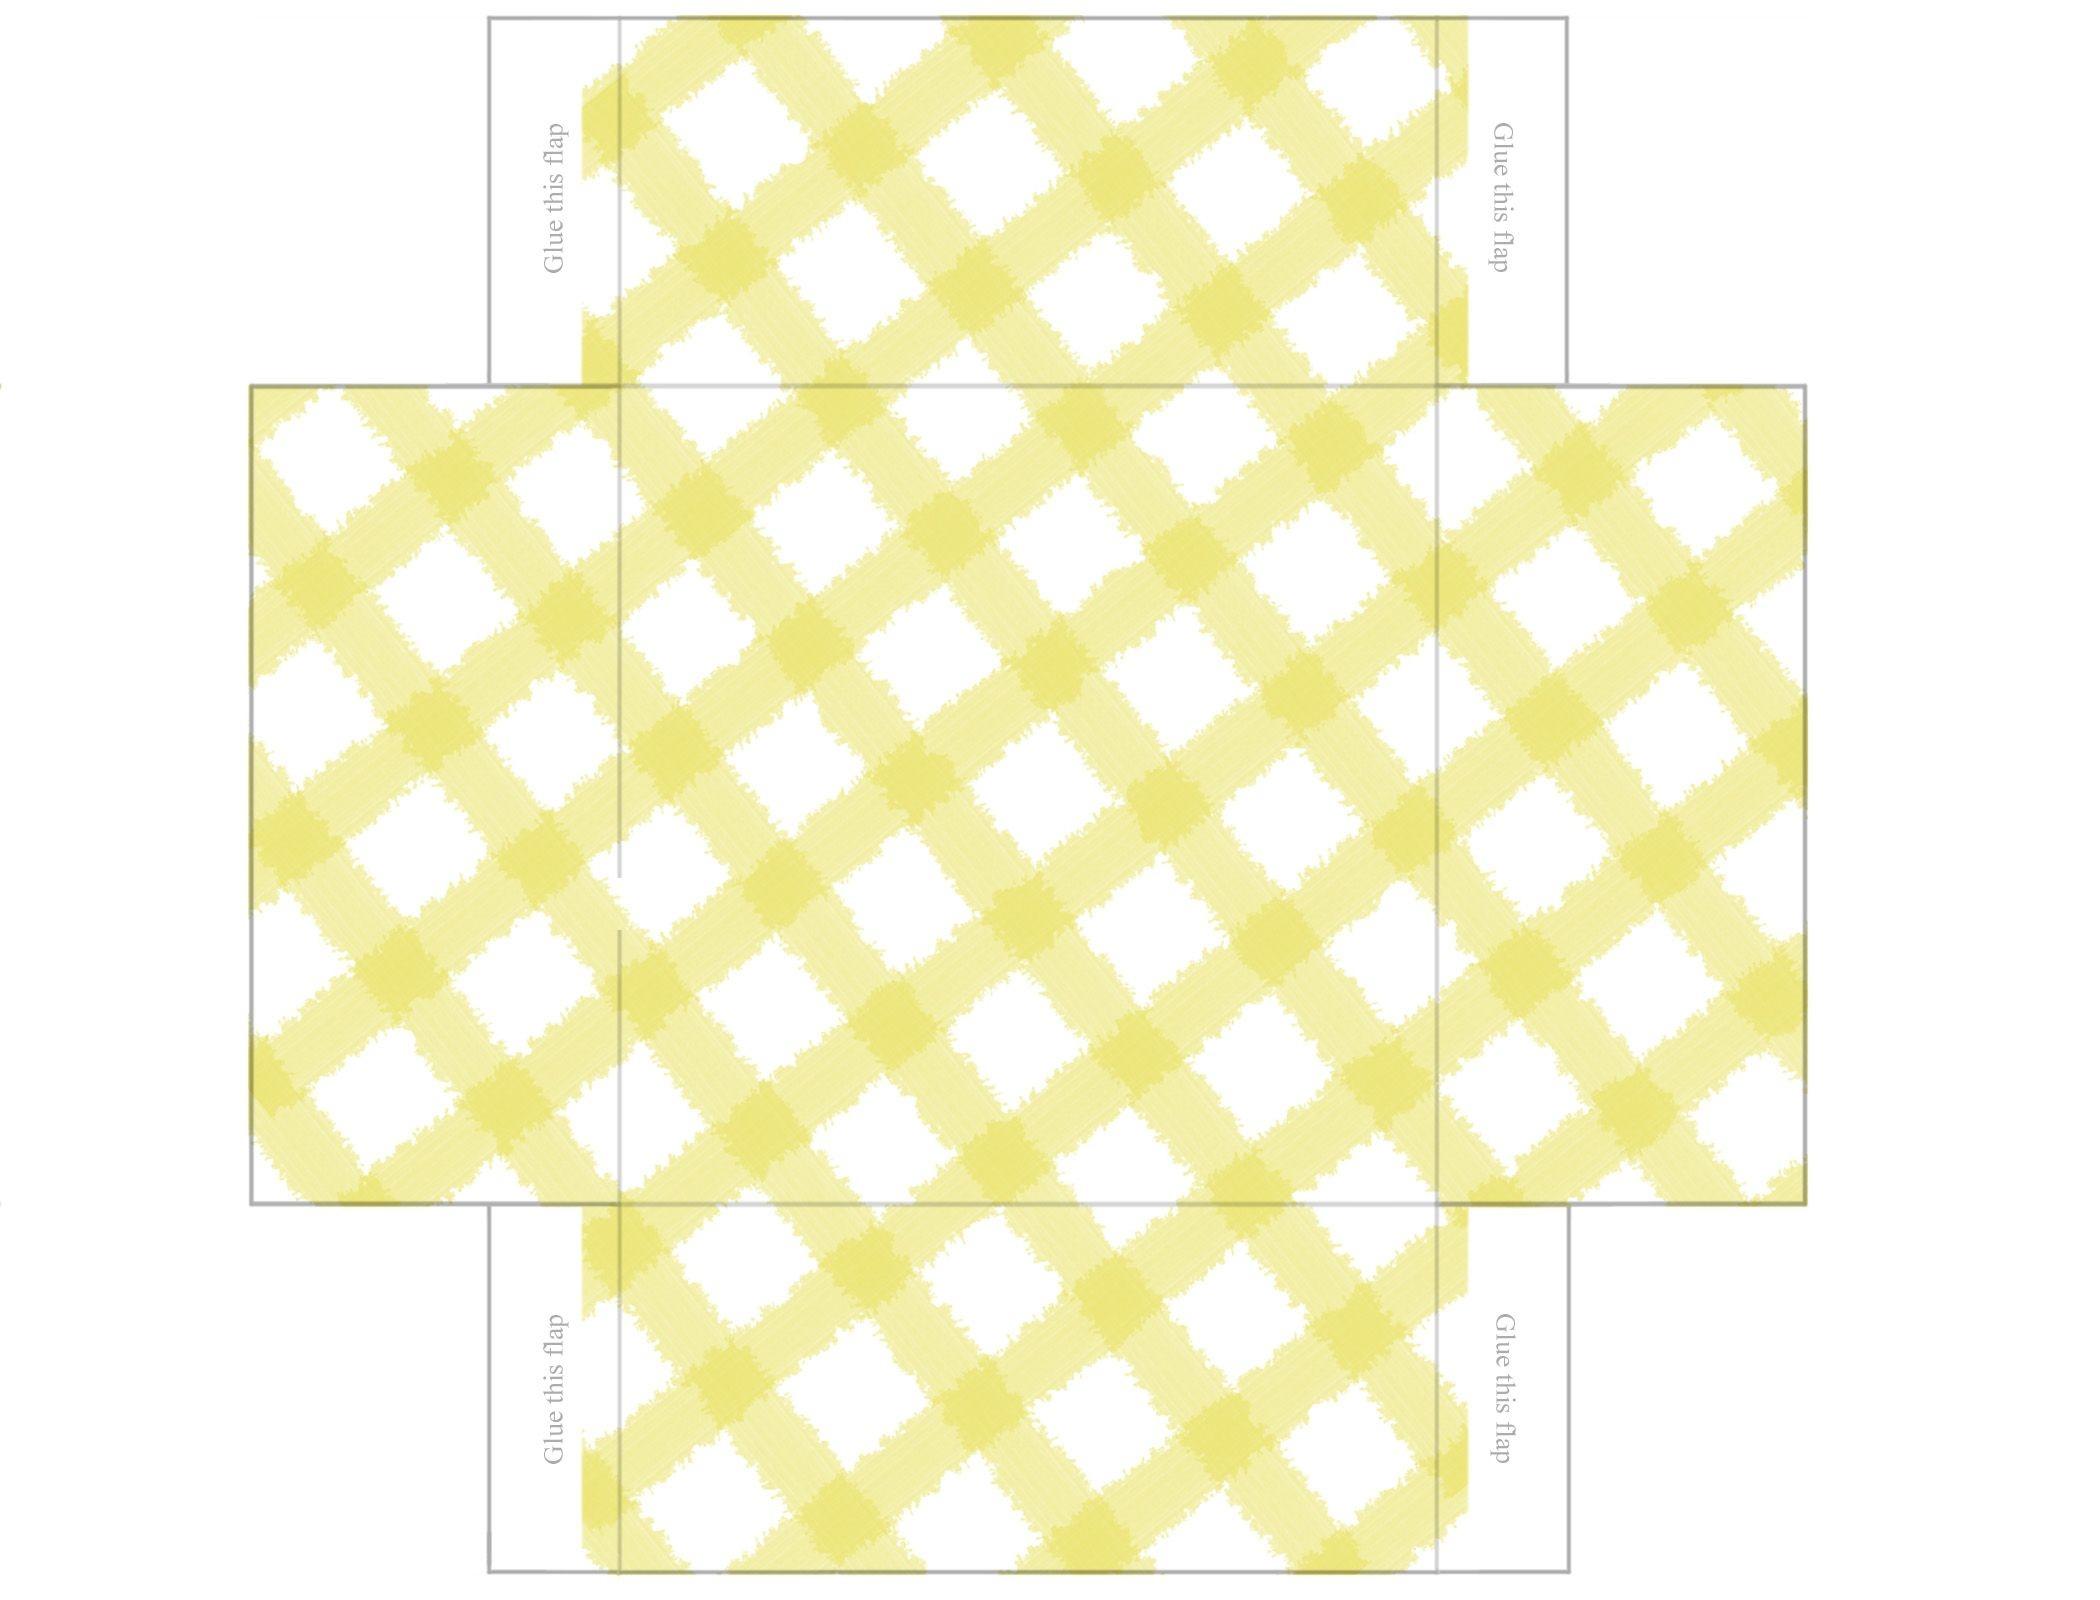 Printable Box Templates Free | Free Printable Templates: Gingham - Free Printable Box Patterns